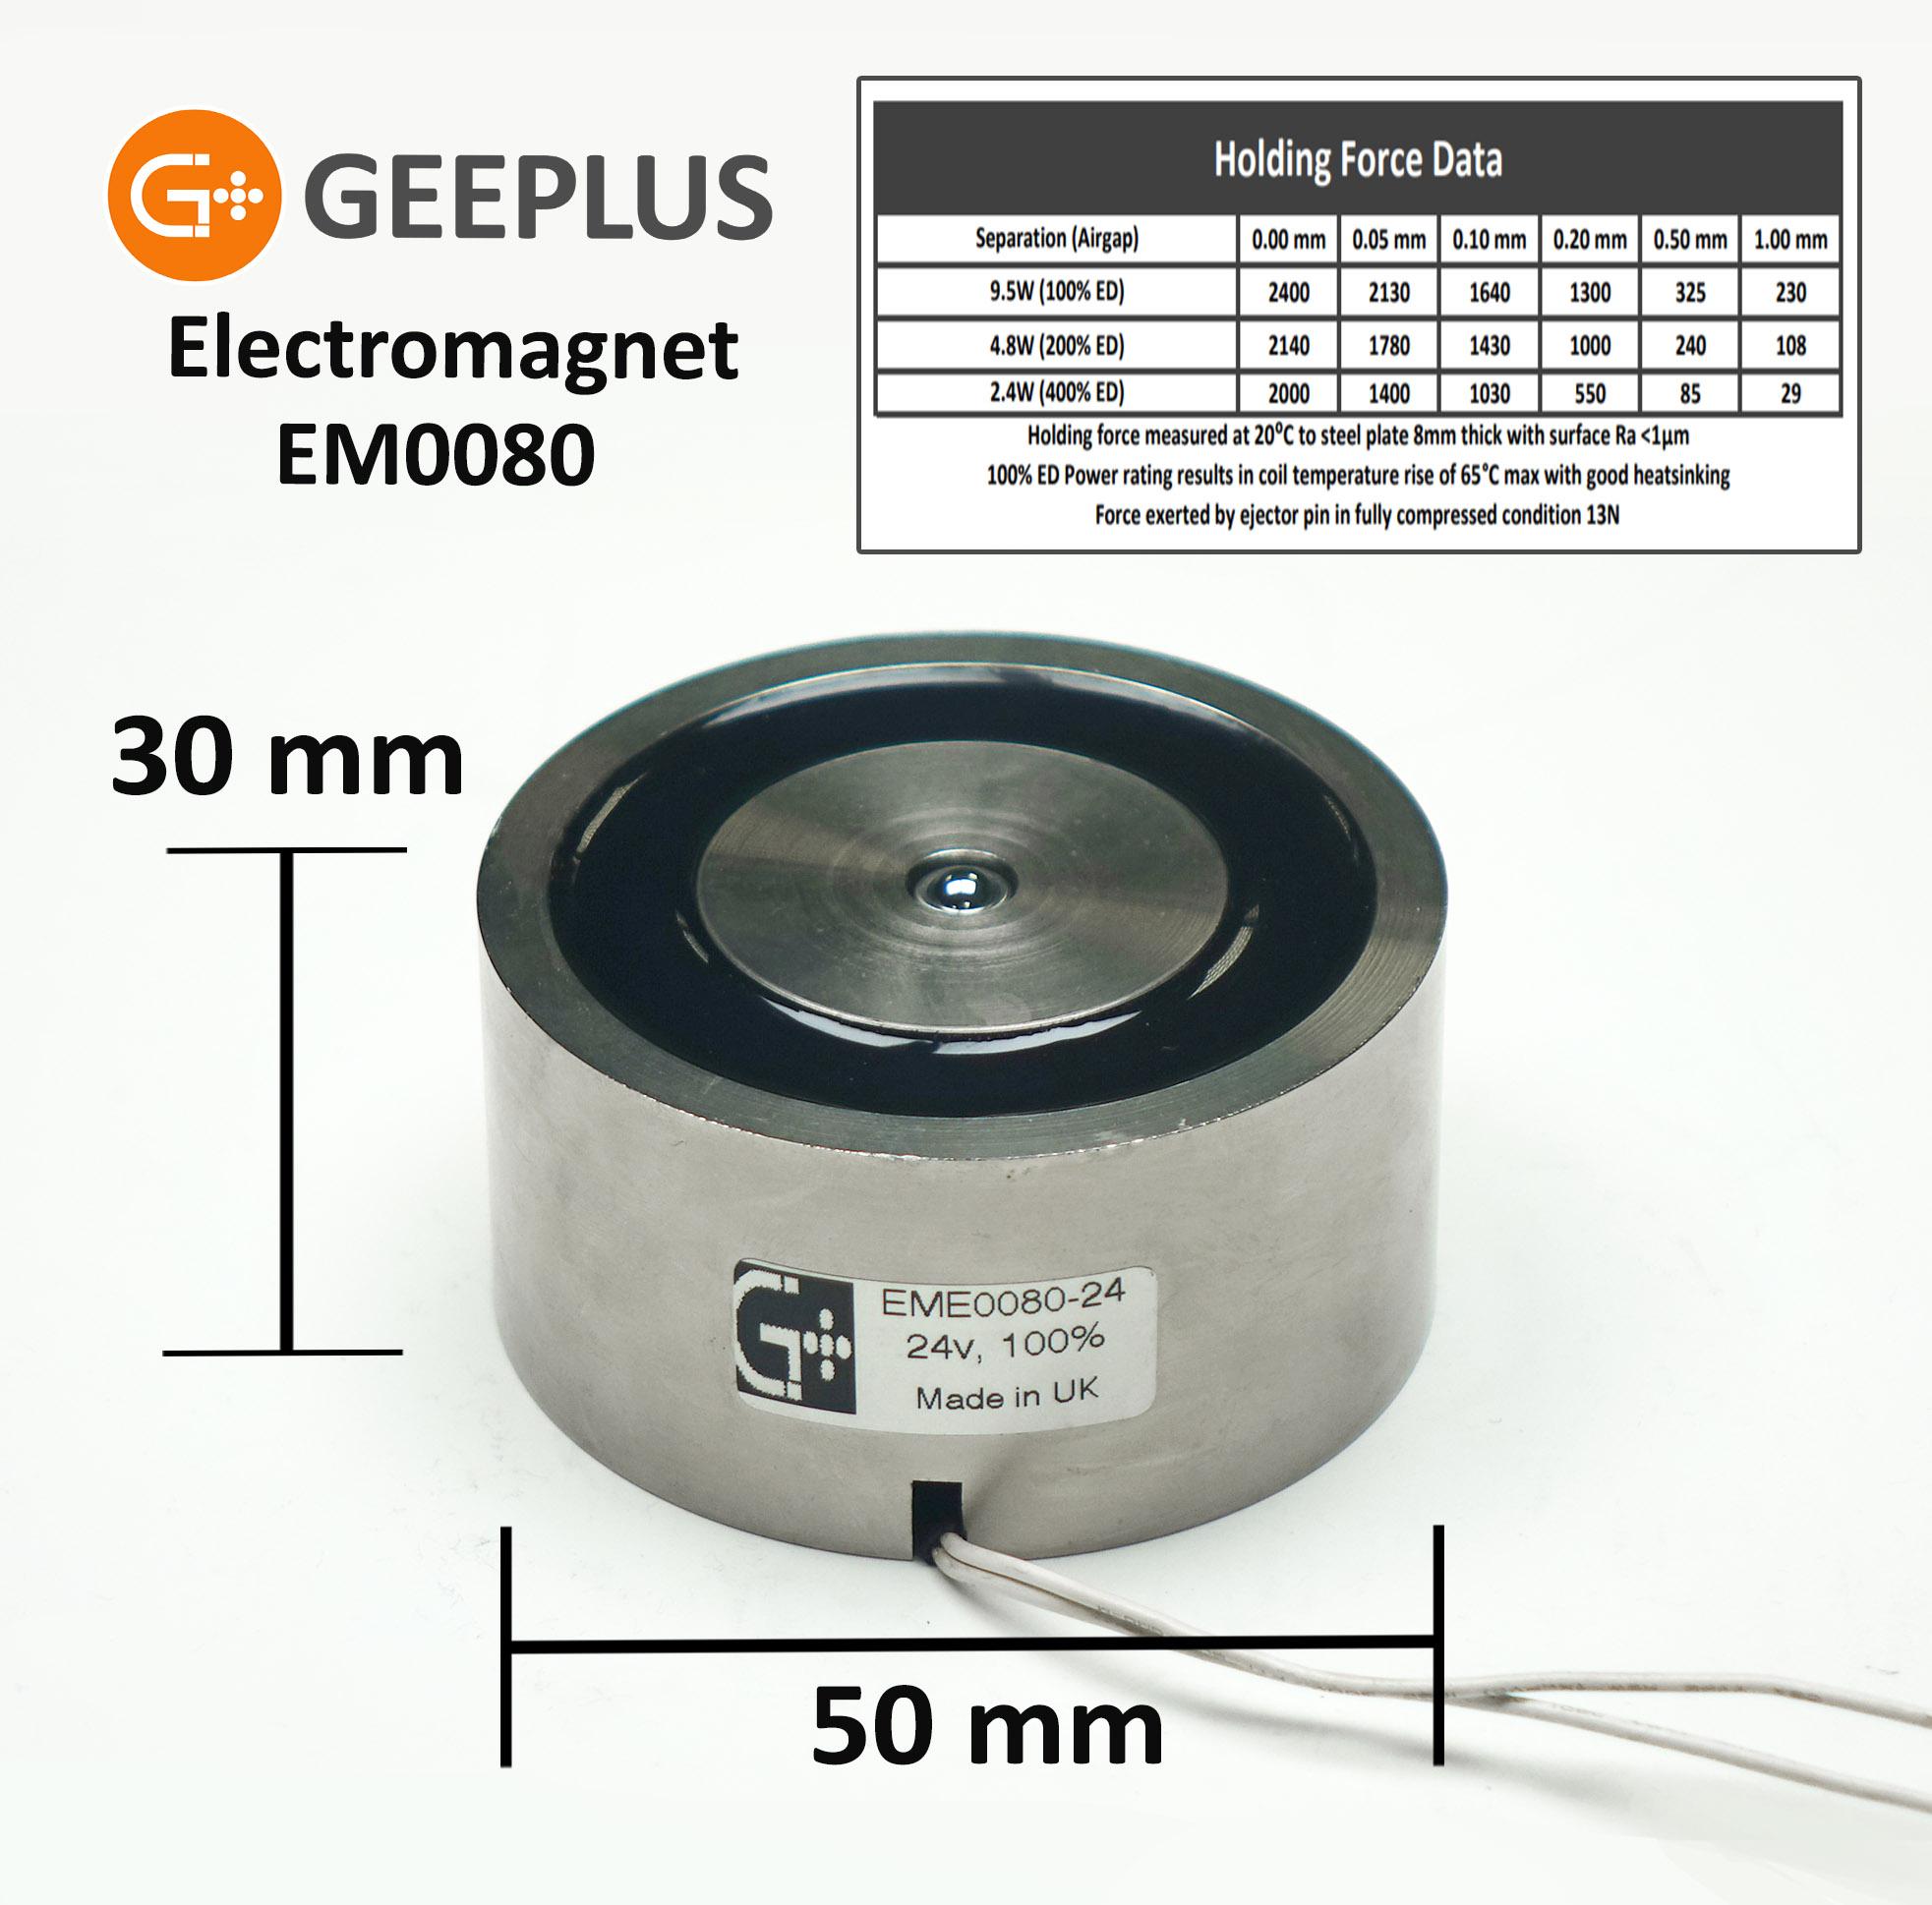 Geeplus Electromagnet EME0080